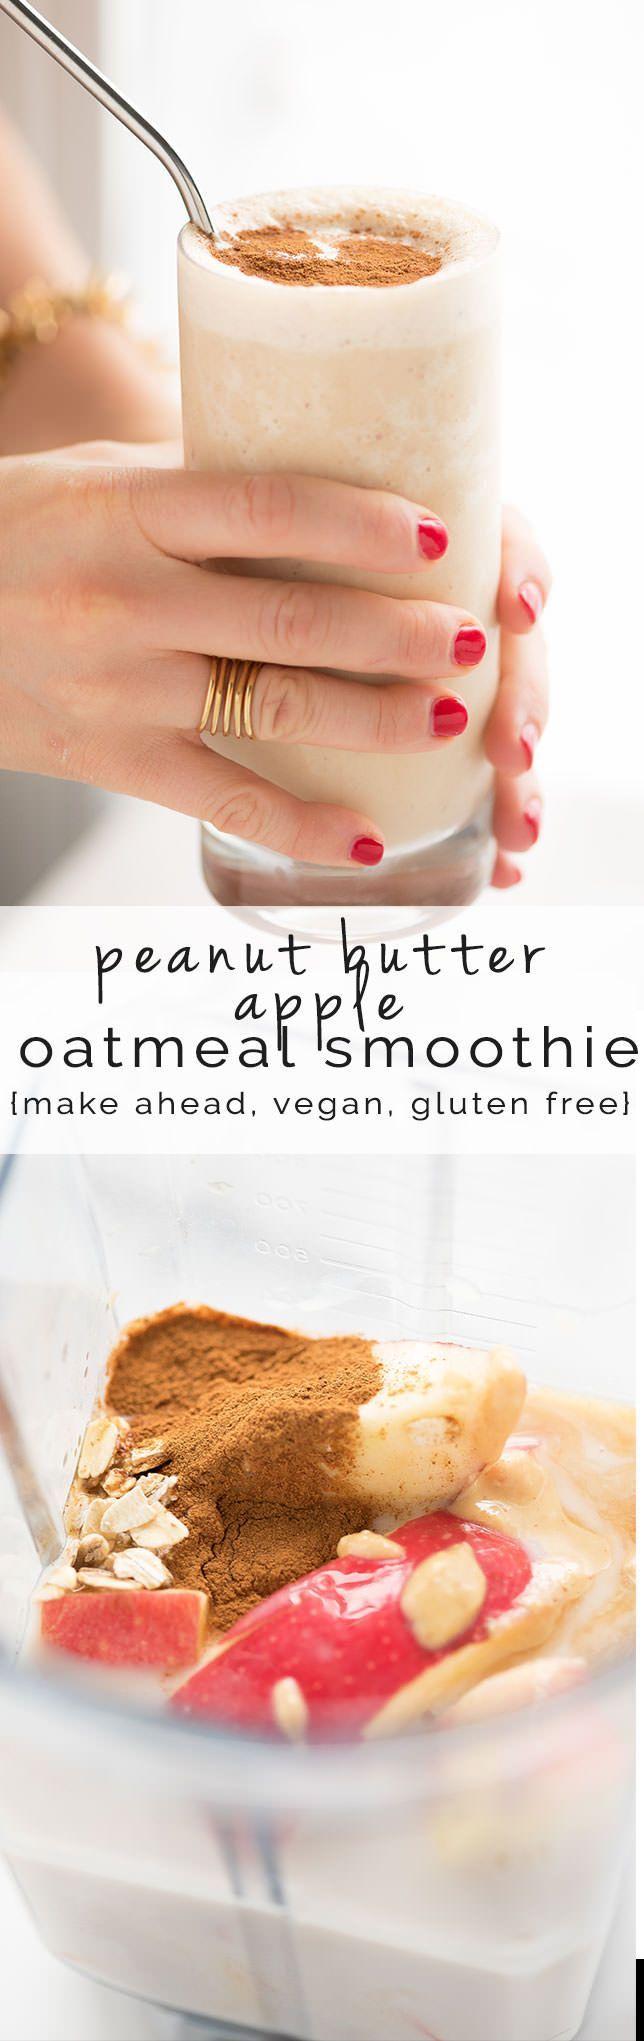 Apple Oatmeal Smoothie Recipes | Peanut Butter, Breakfast, Vegan, Gluten Free, Healthy, Weightloss, Cinnamon